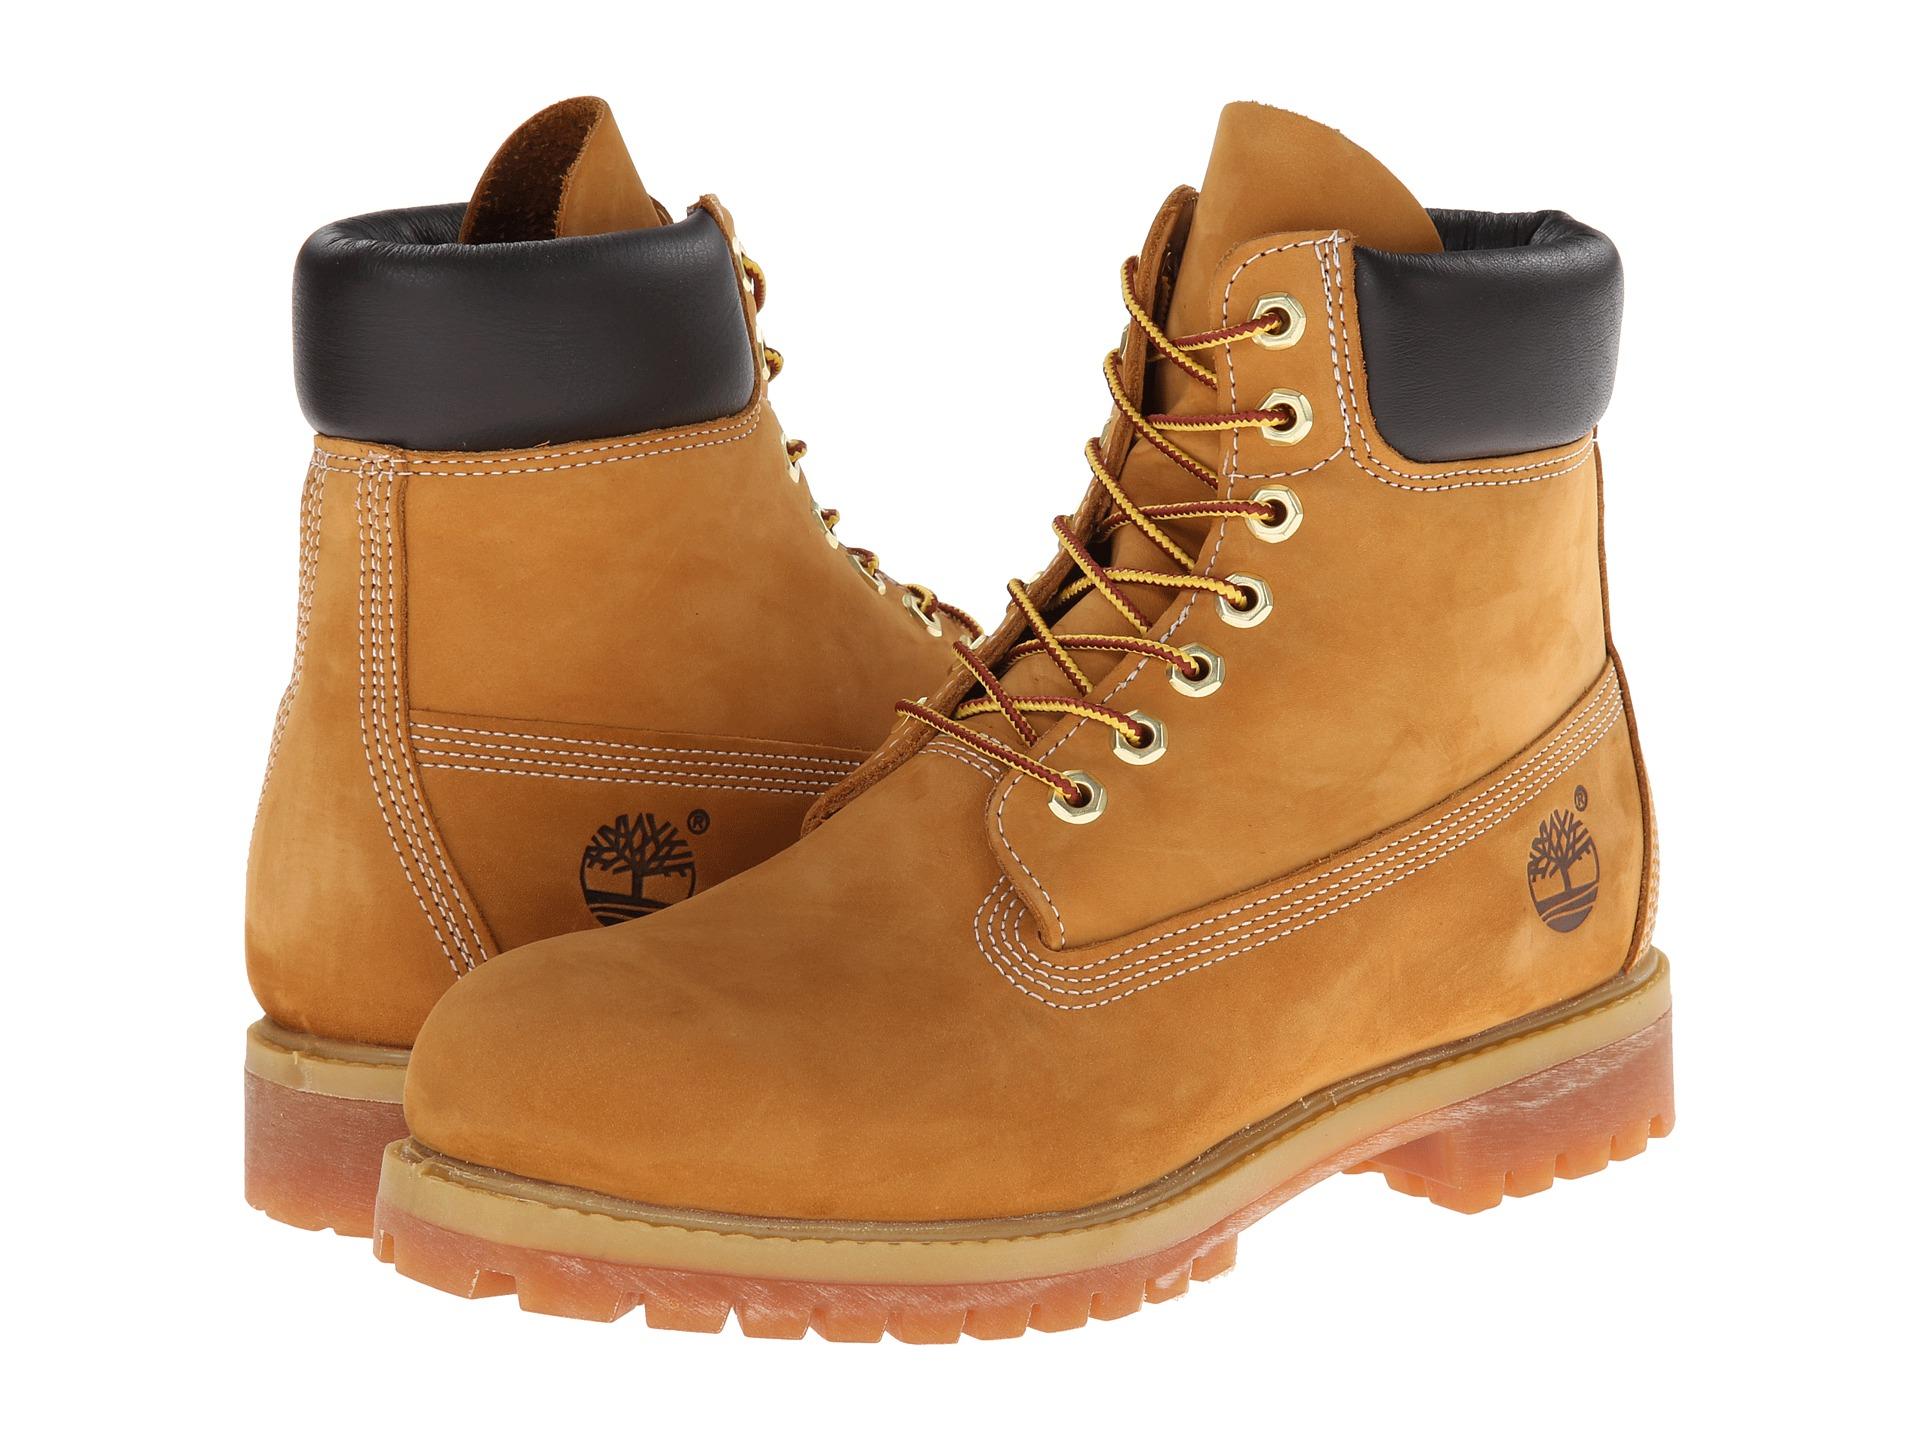 6 in premium boot timberland